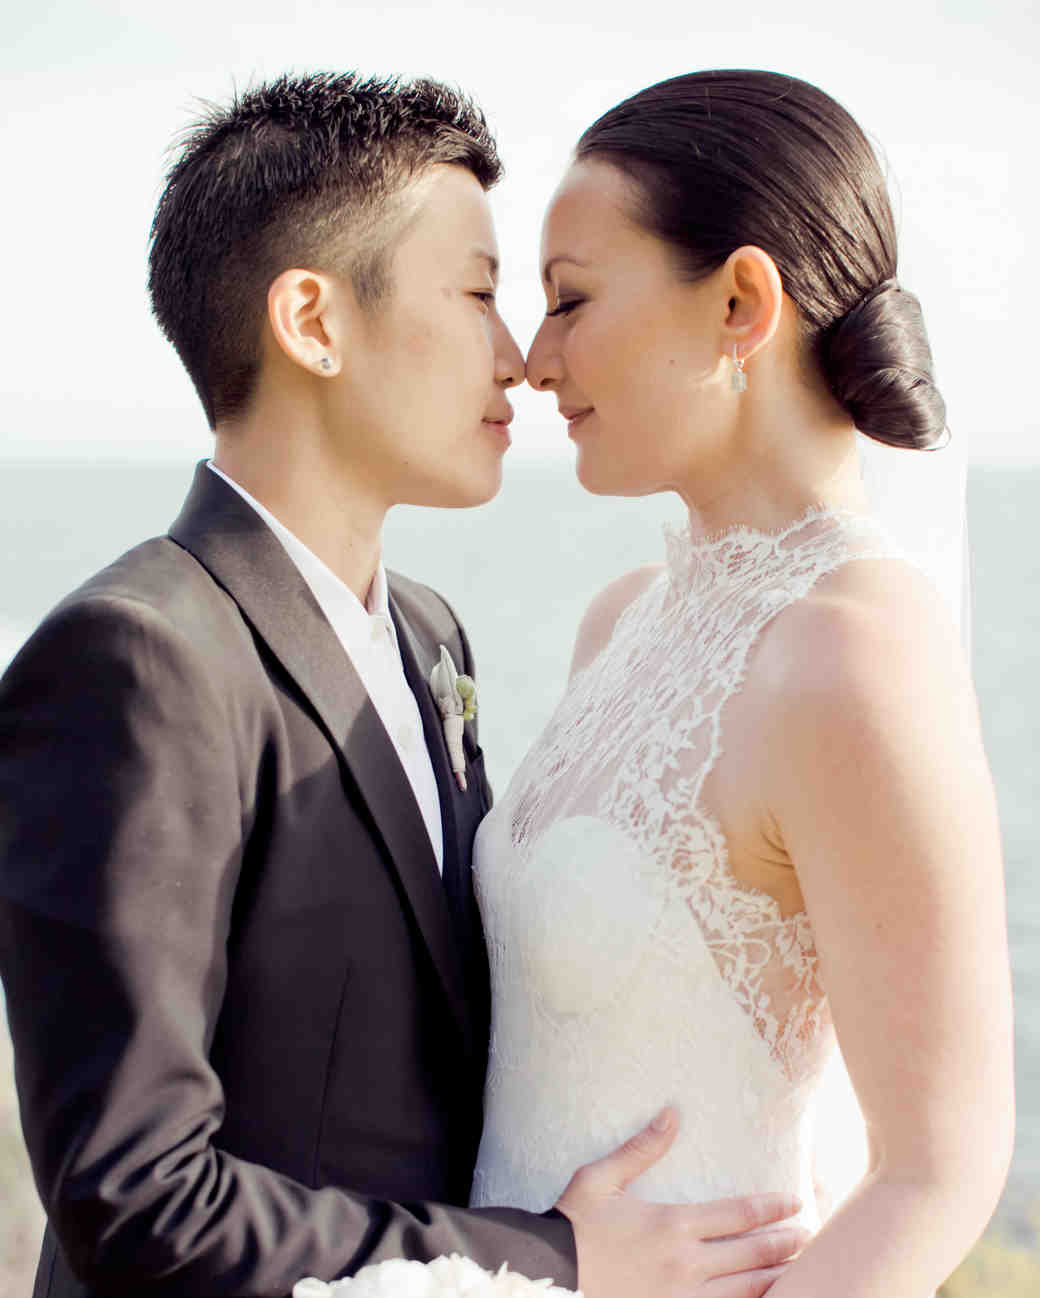 emma-michelle-wedding-couple-1004-s112079-0715.jpg